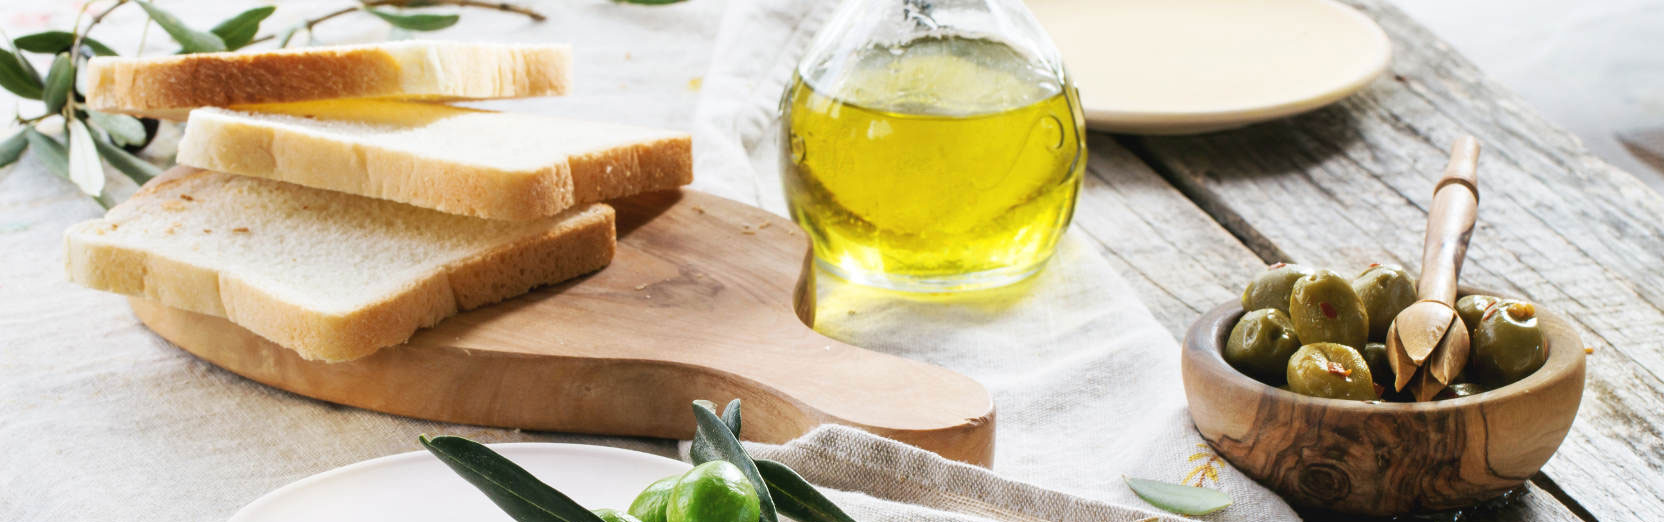 aceite-mediterranea-campoto